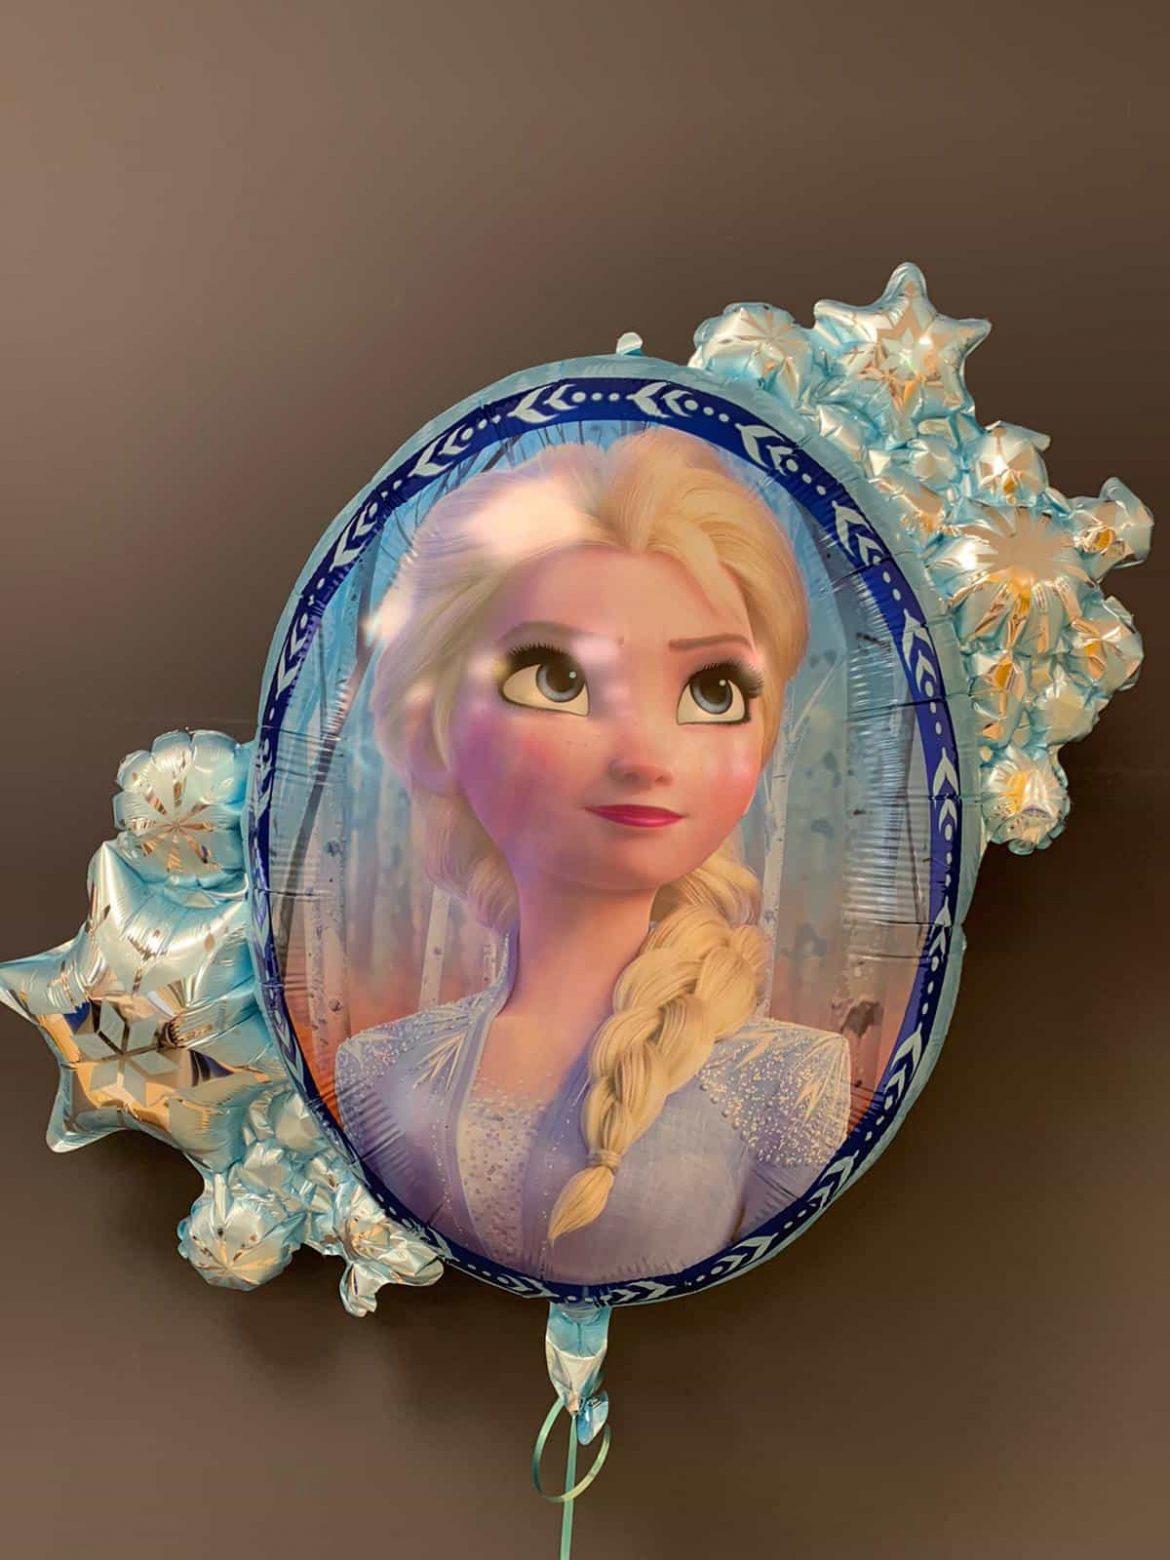 Frozen Disney<br />Heliumballon € 8,90<br />2 Seiten - Elsa 1